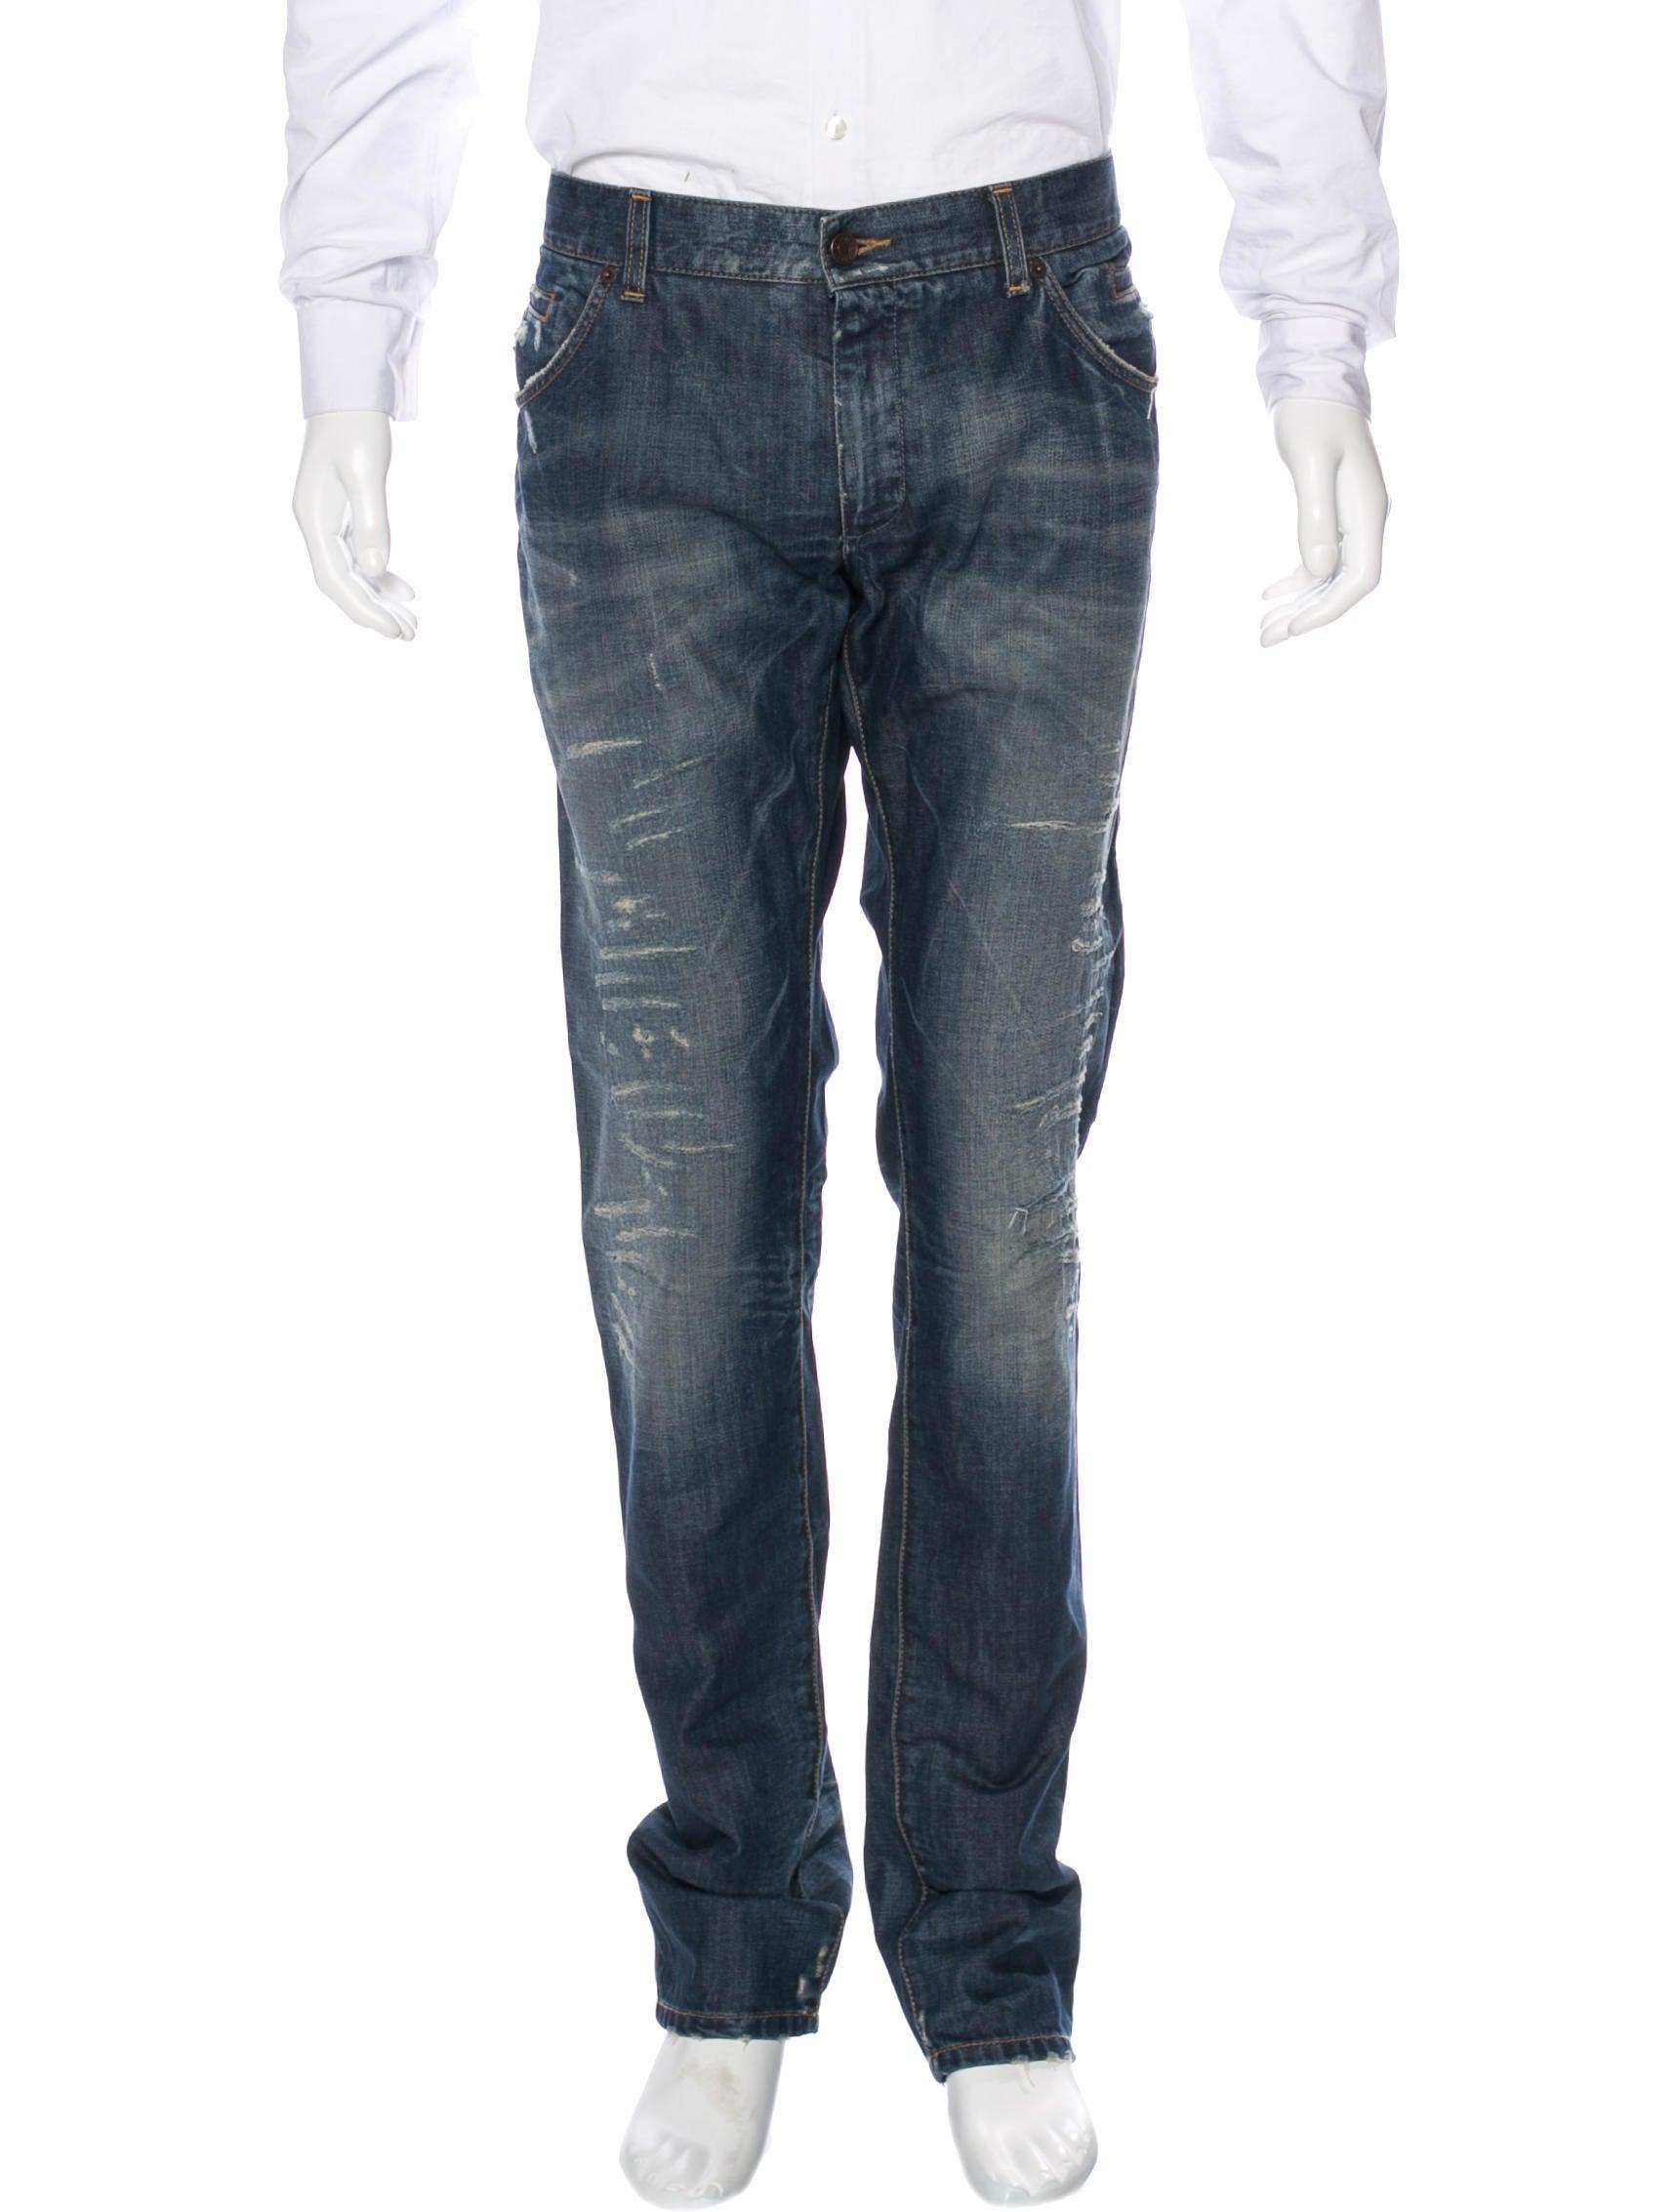 dolce gabbana distressed skinny jeans clothing. Black Bedroom Furniture Sets. Home Design Ideas